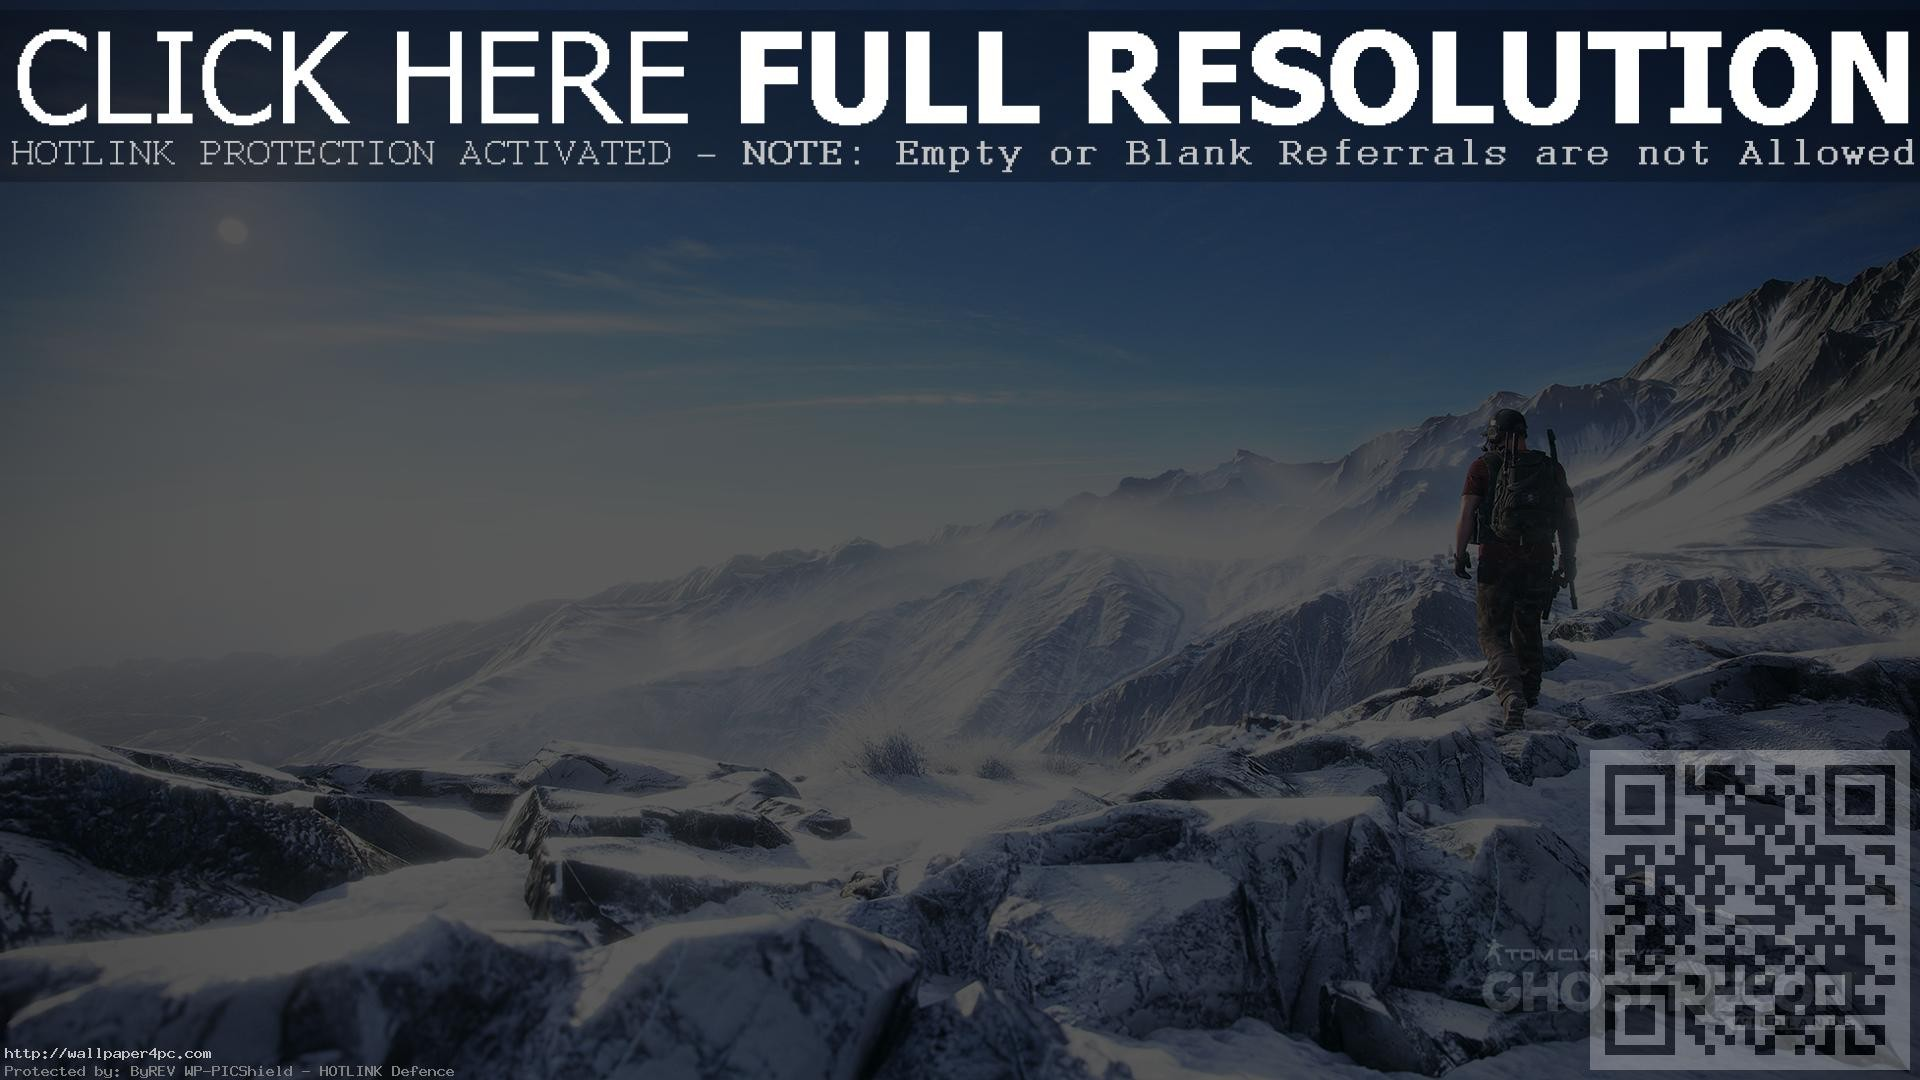 Ghost Recon Wildlands Wallpaper ① Download Free Stunning High